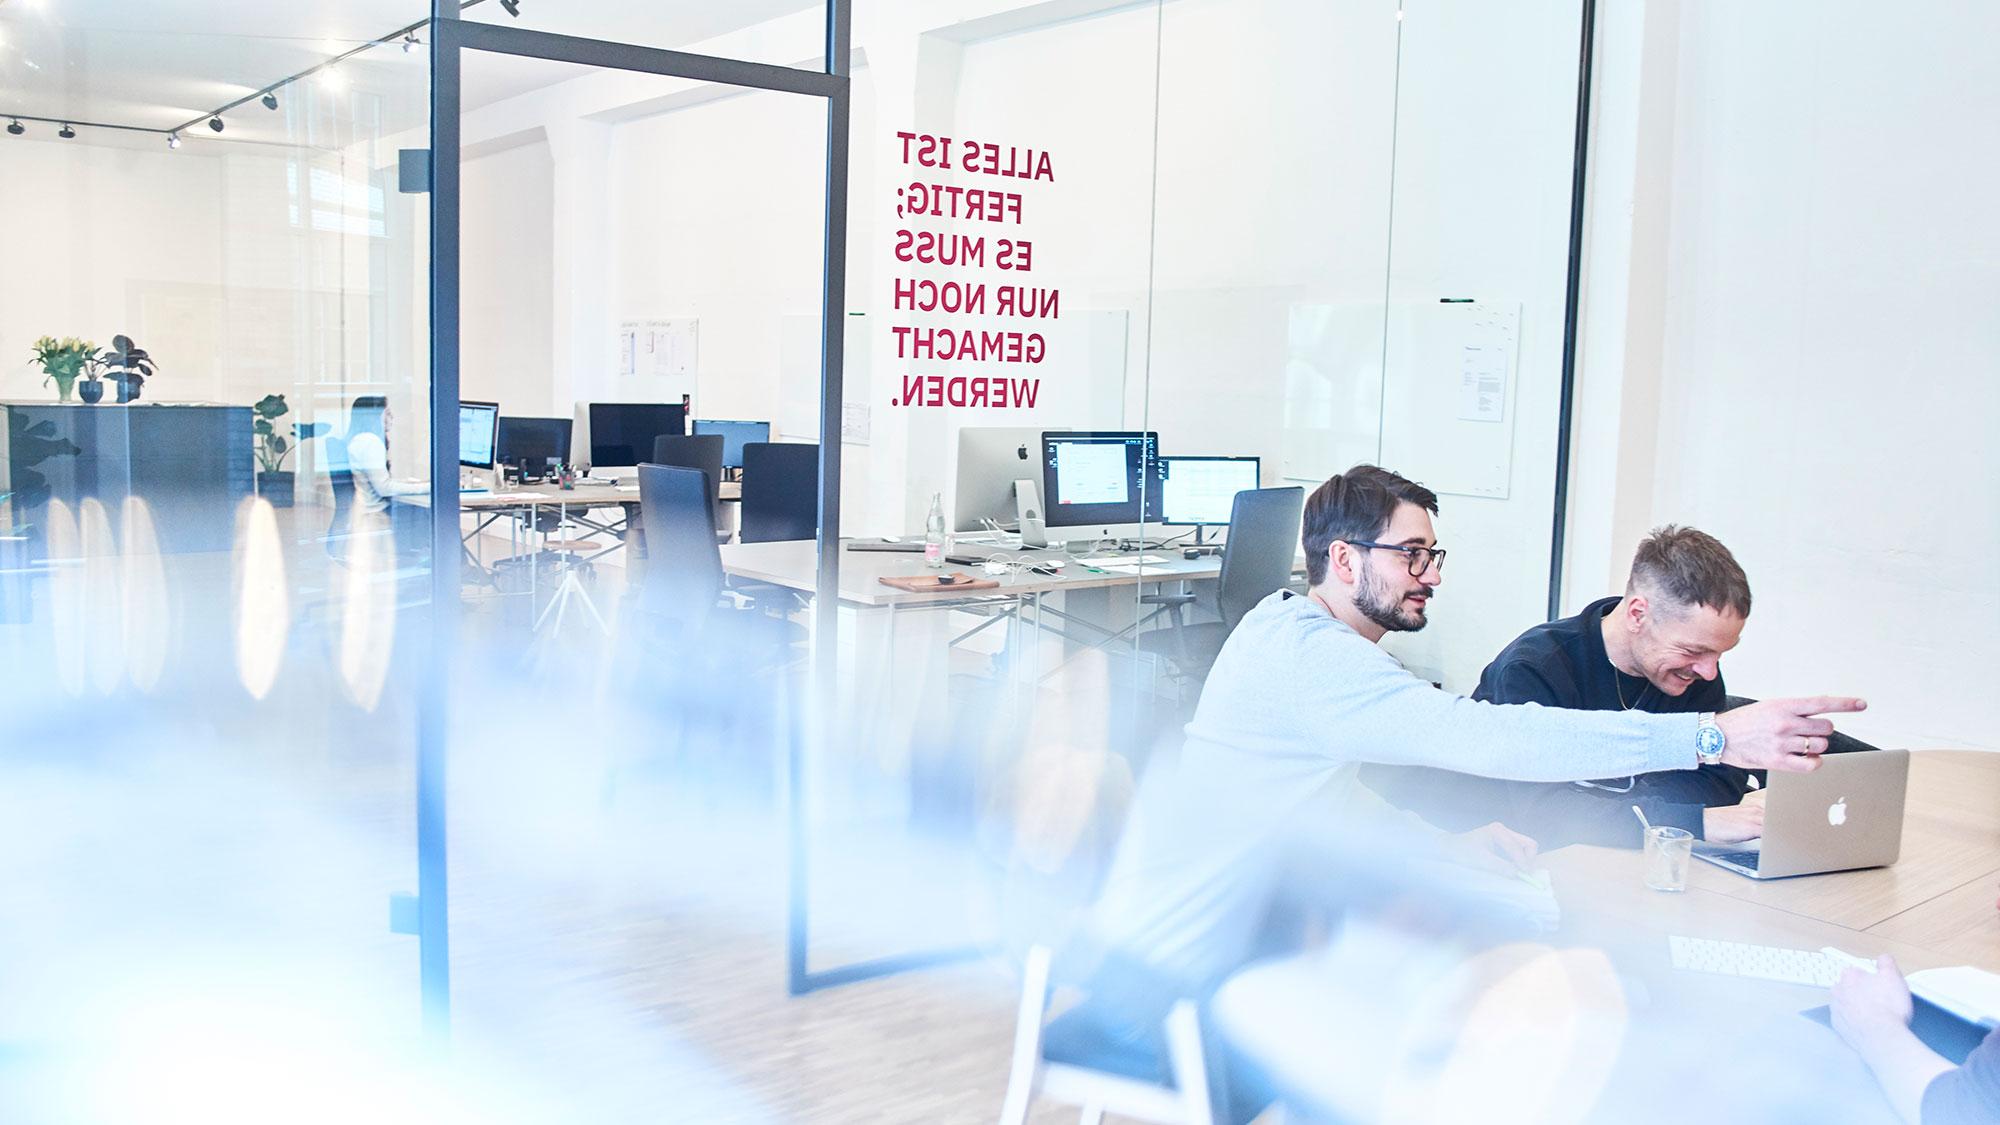 Agile Strukturen – Besprechung im Team